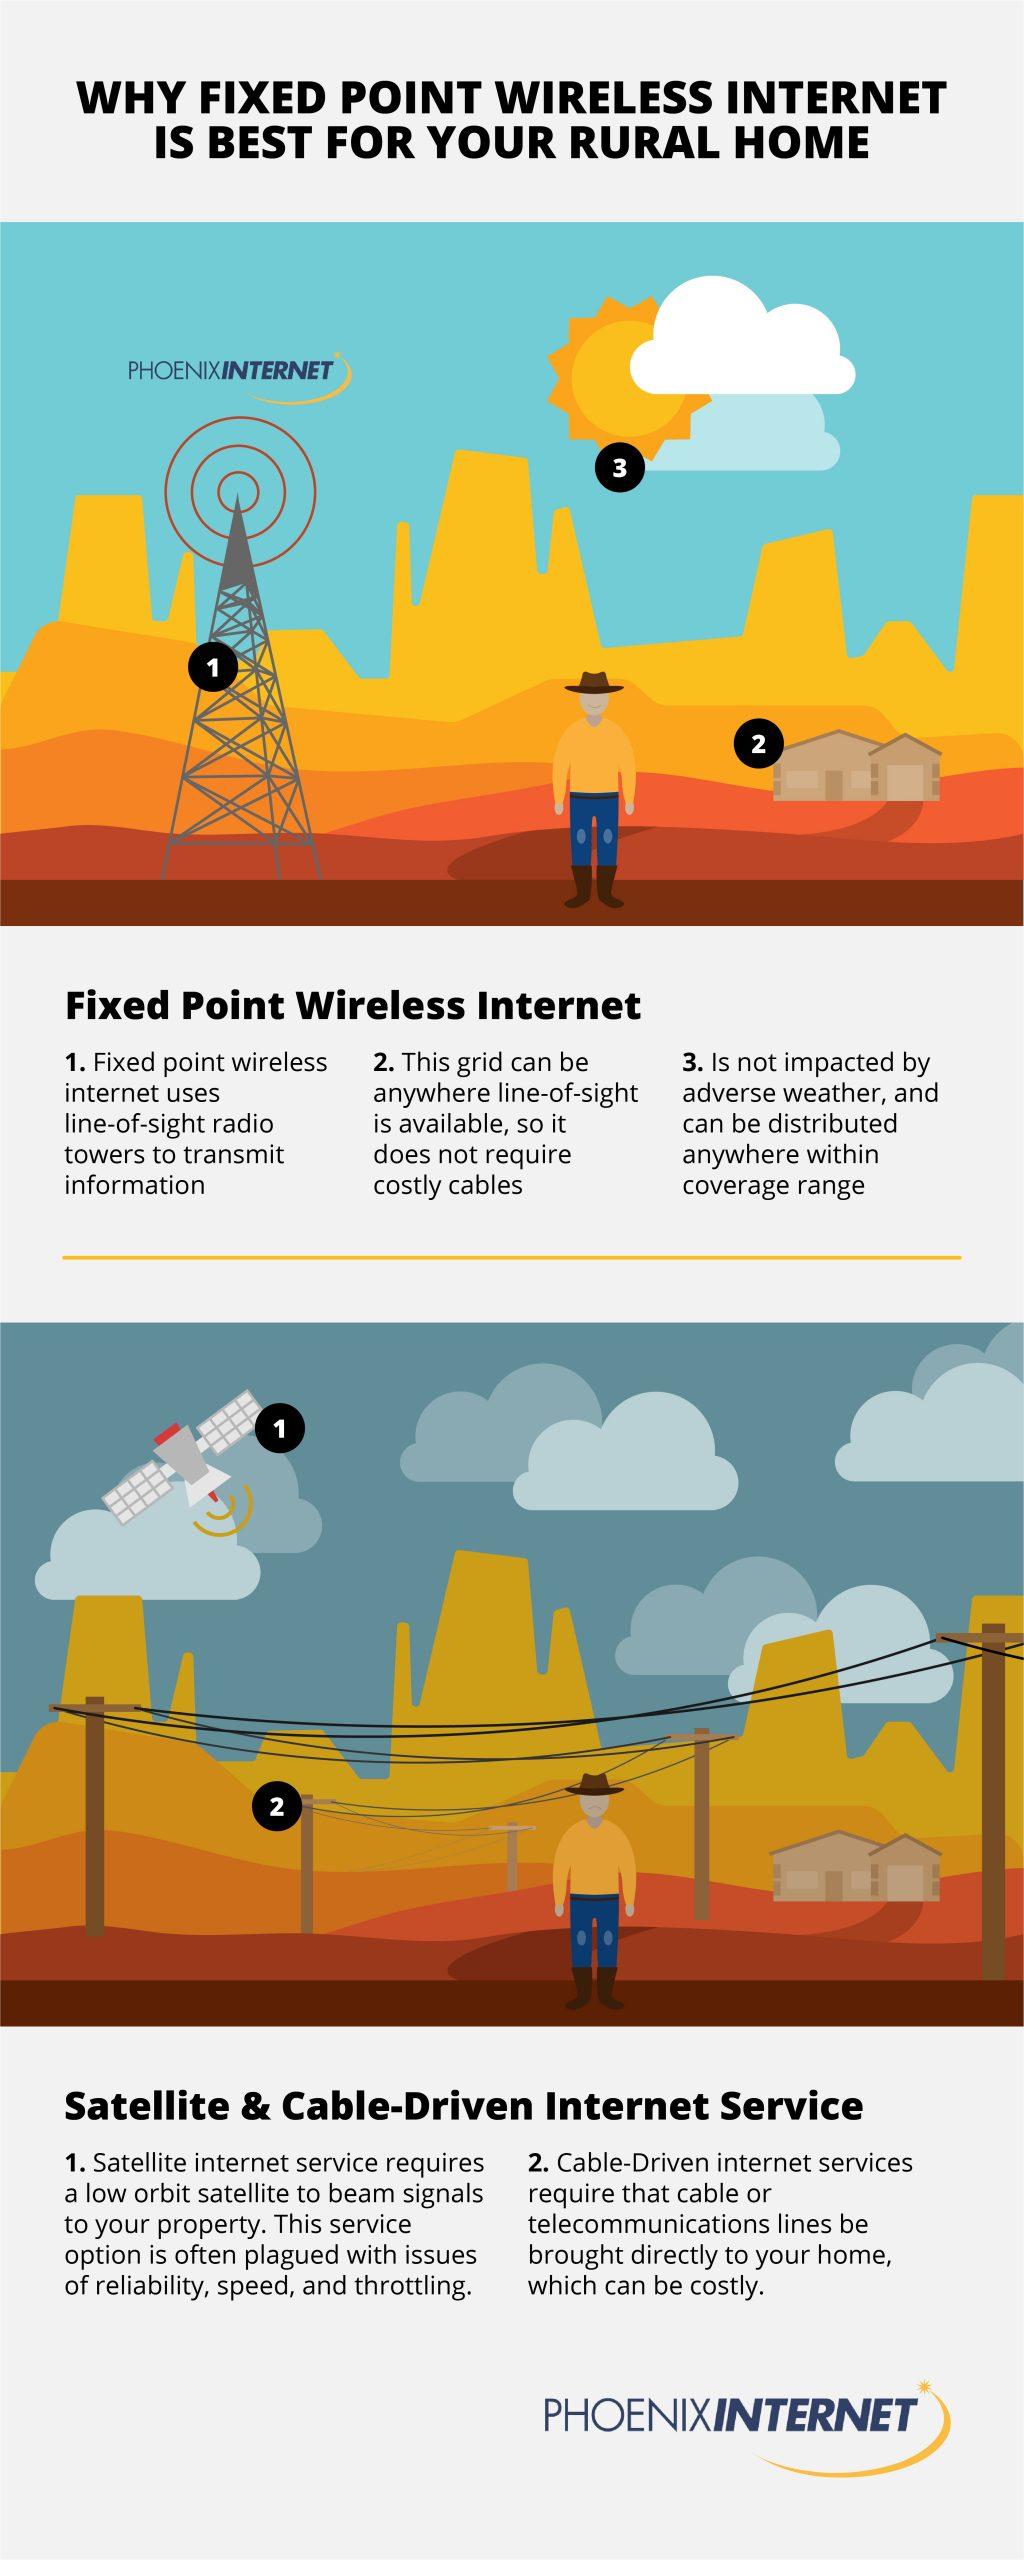 fixed wireless internet, rural internet options, internet options for rural areas, rural internet providers